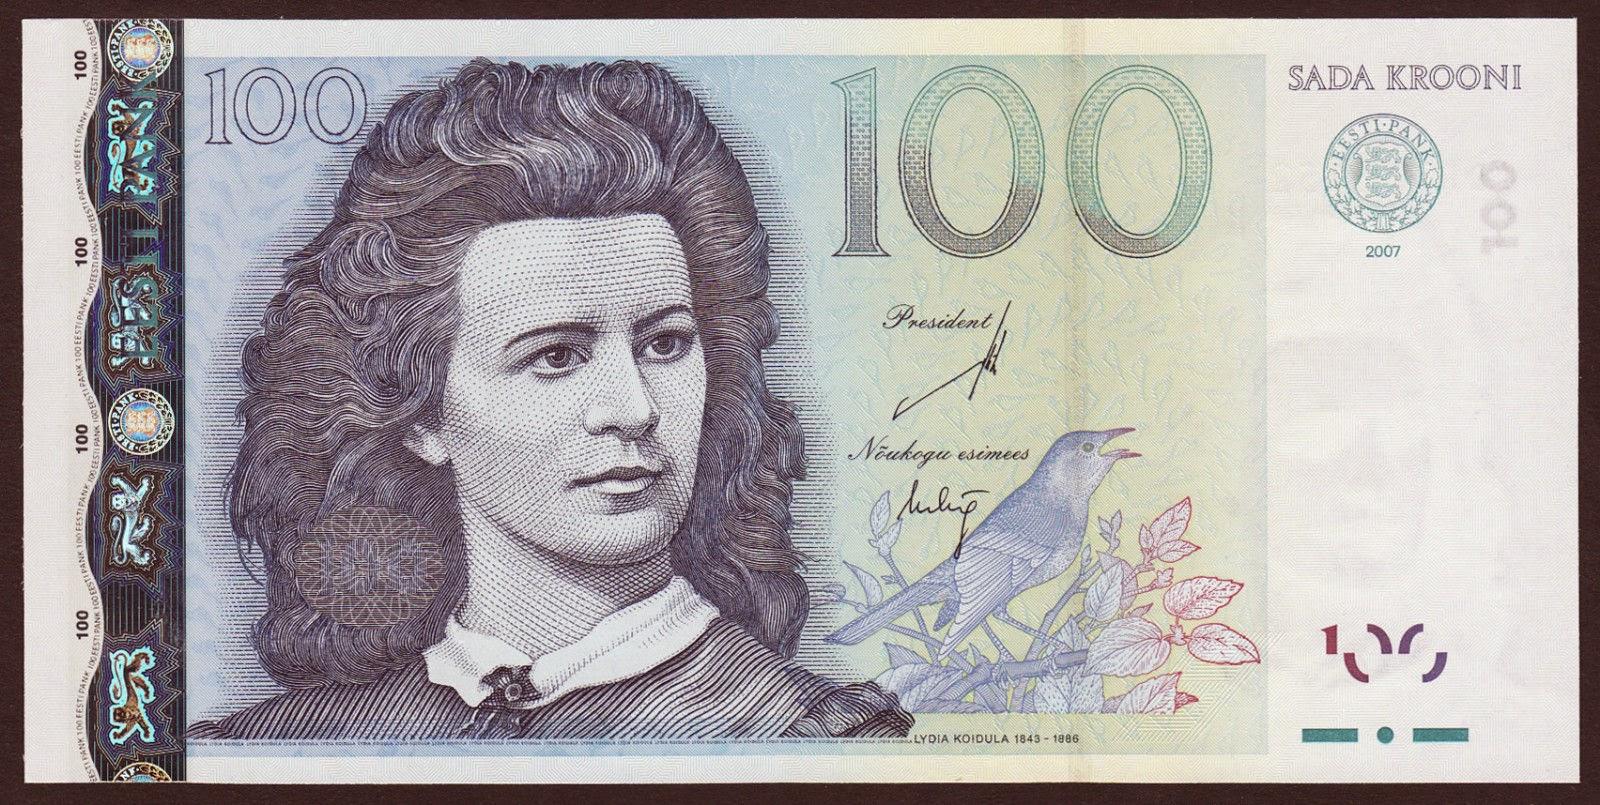 Estonia currency money 100 krooni banknote, Lydia Koidula